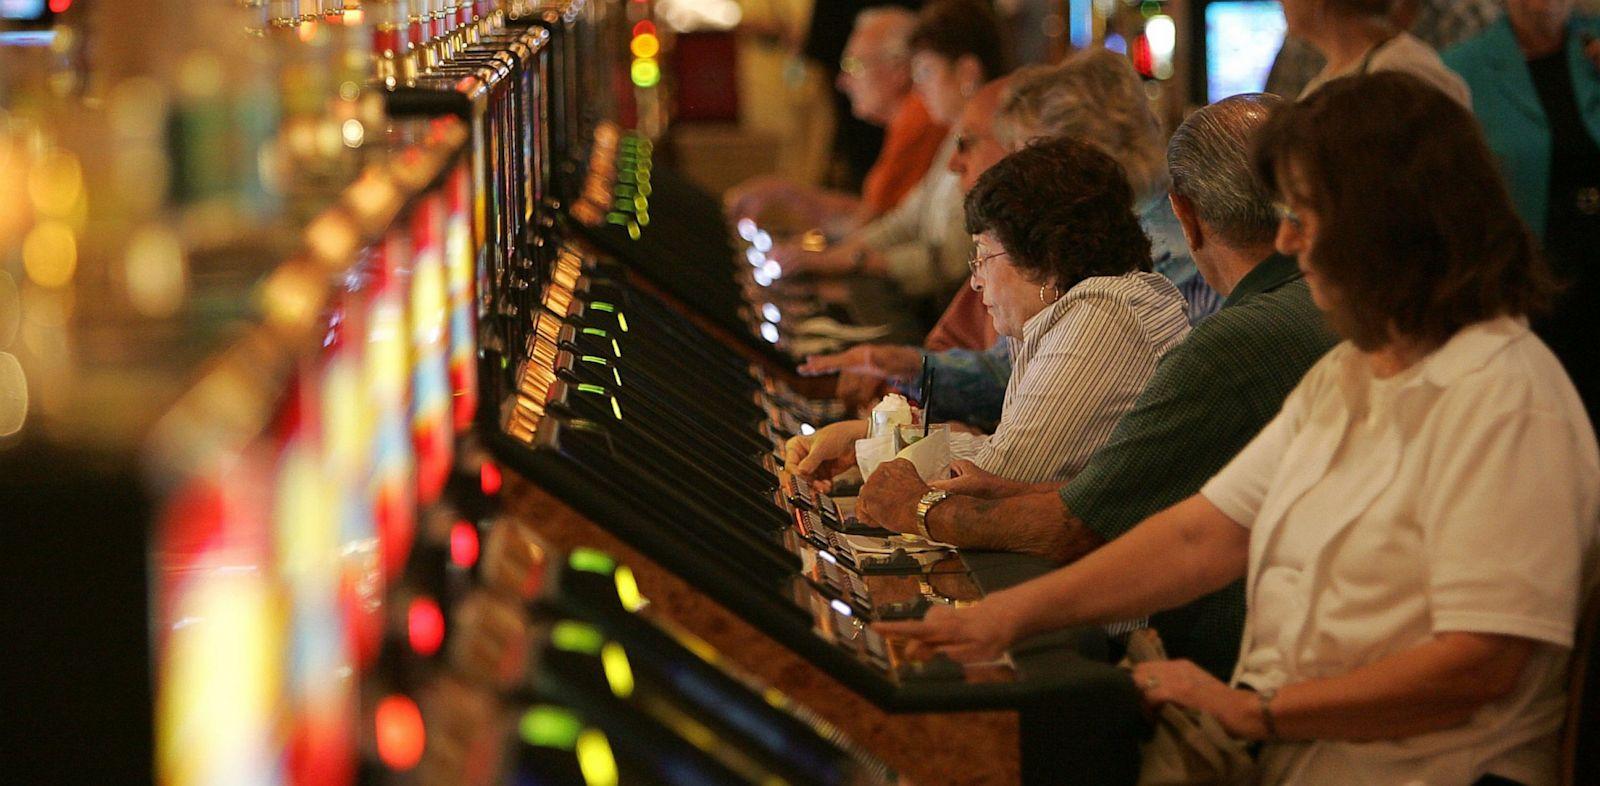 PHOTO: People playing slot machines